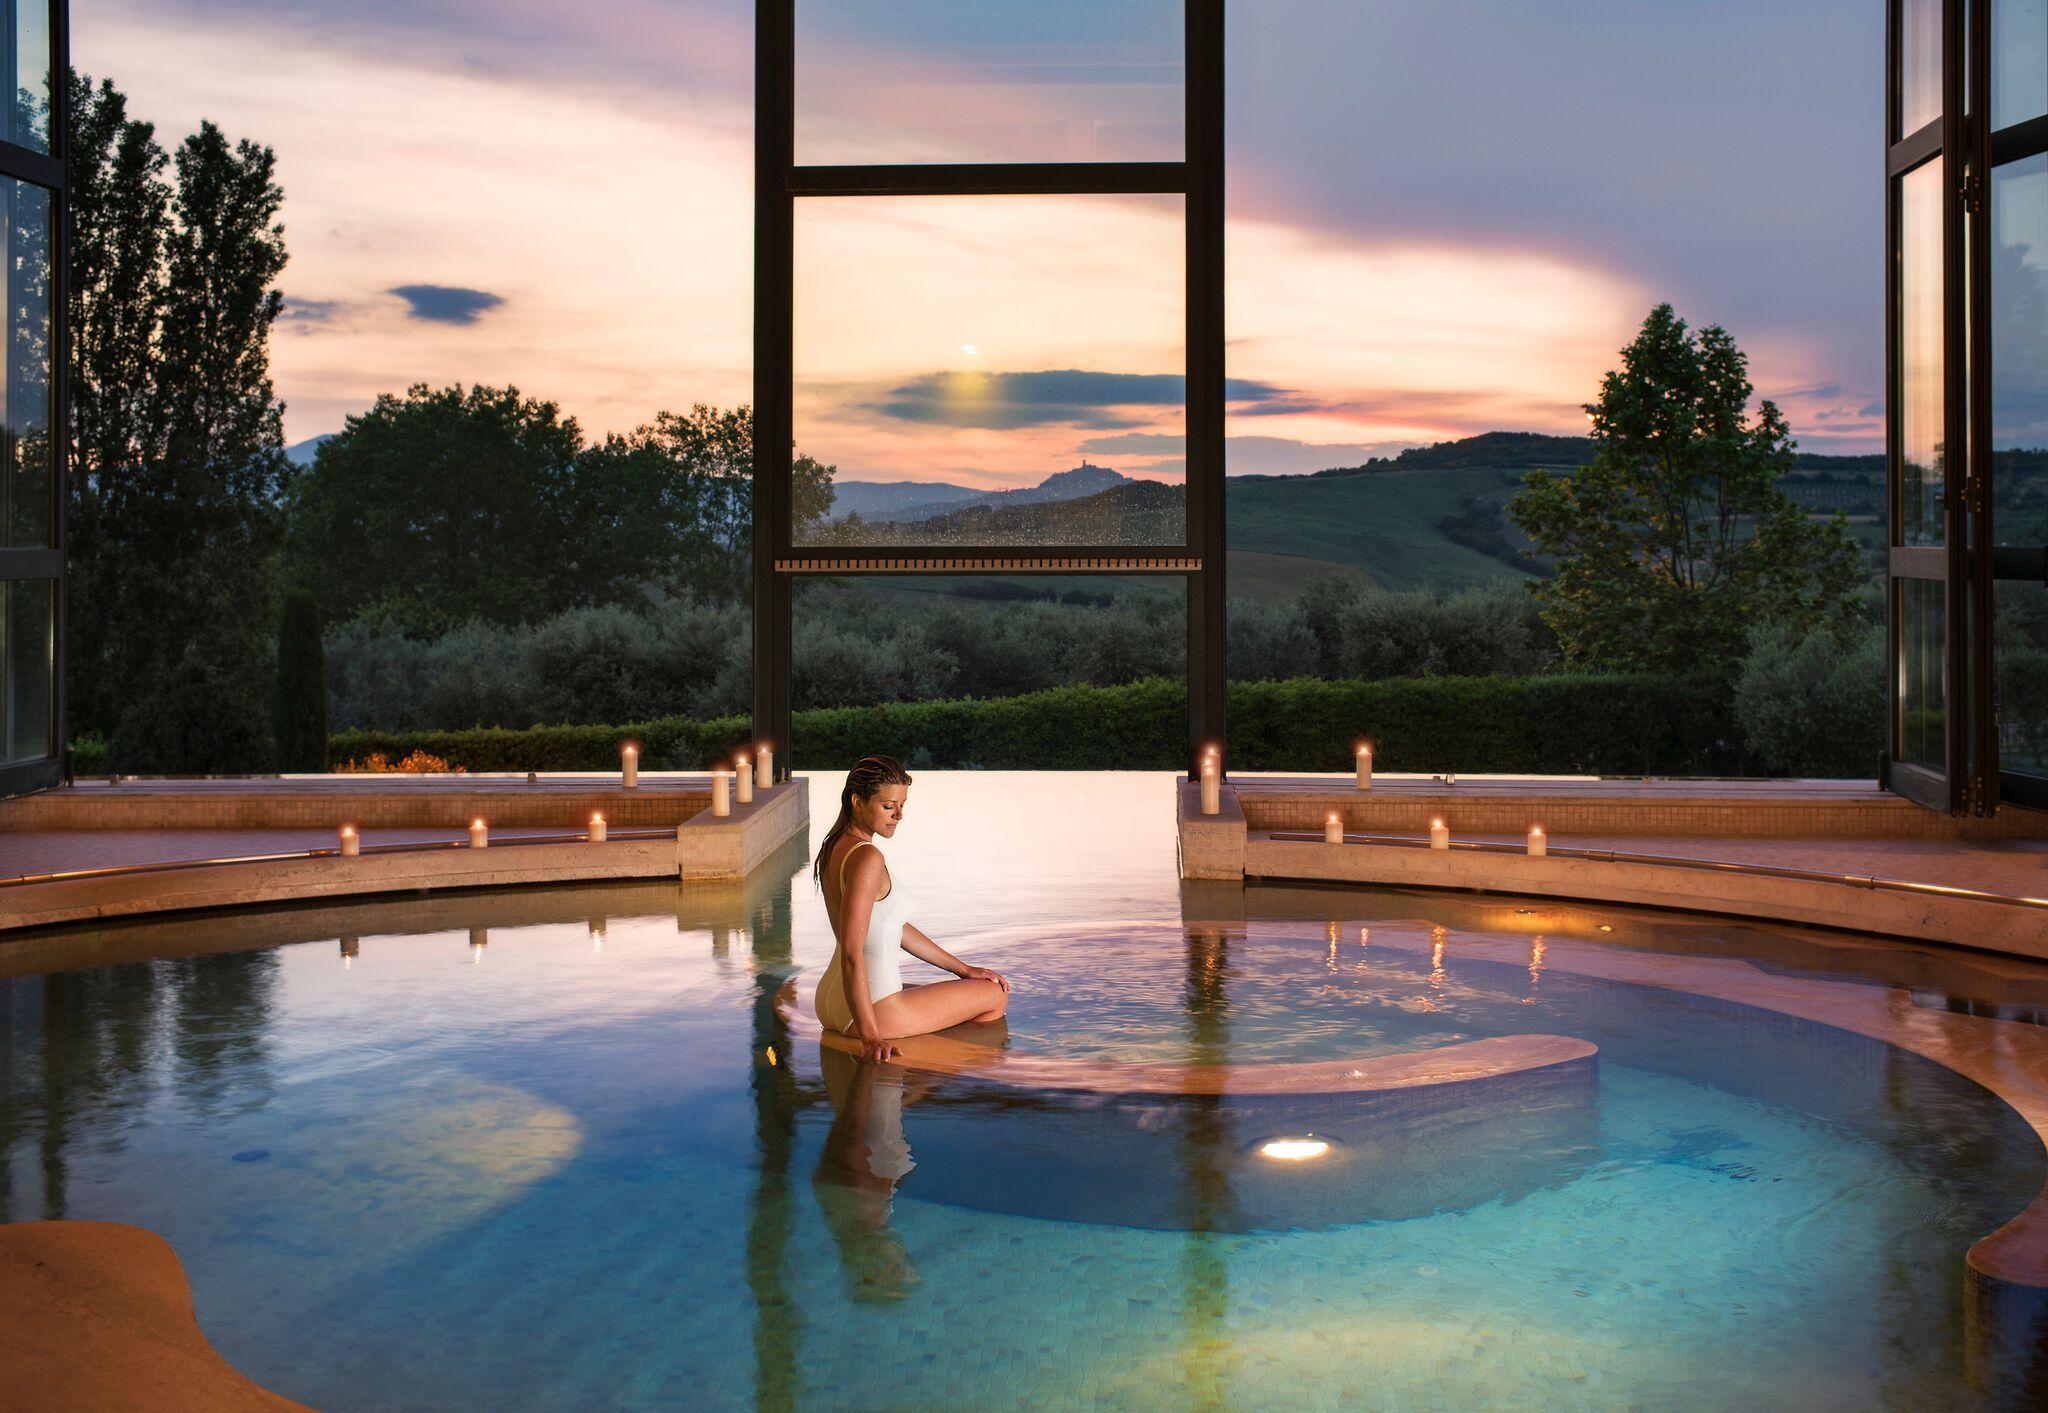 Fonteverde terme hotel san casciano dei bagni siena toscana - Fonteverde spa san casciano dei bagni ...